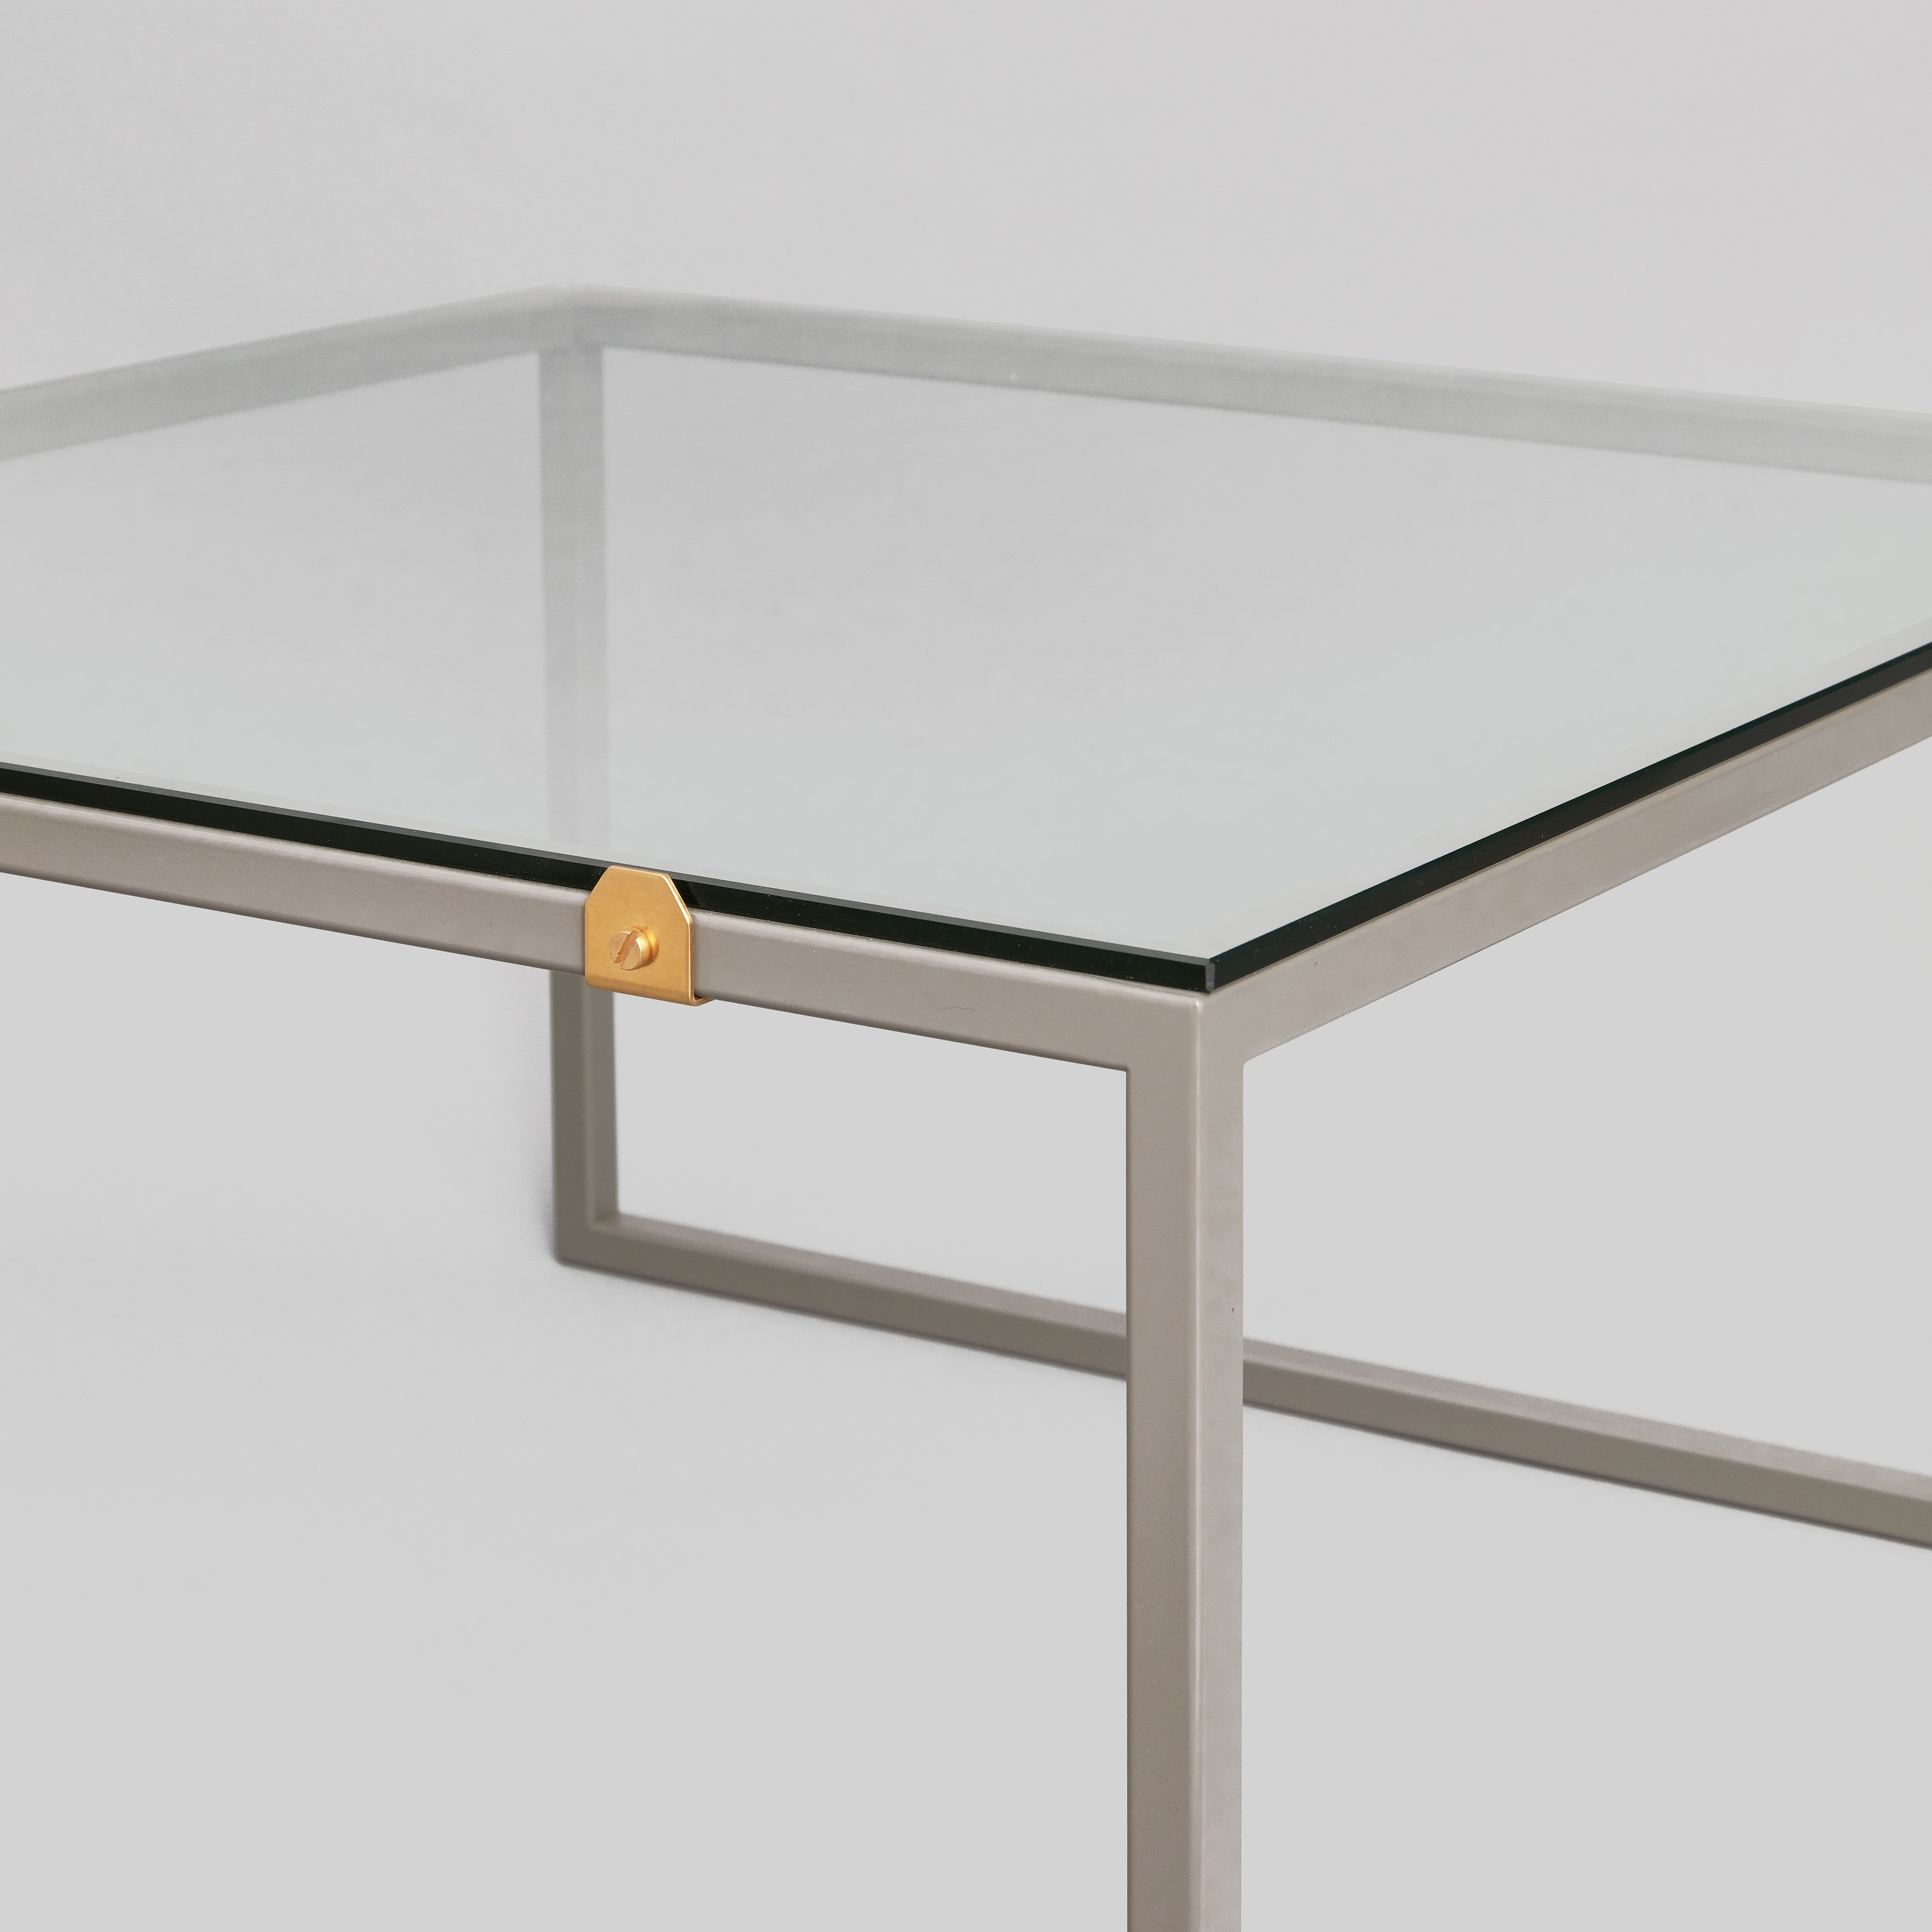 59f7d3fb78186fafbbeb0f327e77e9cb Incroyable De Table Basse Palette Europe Schème